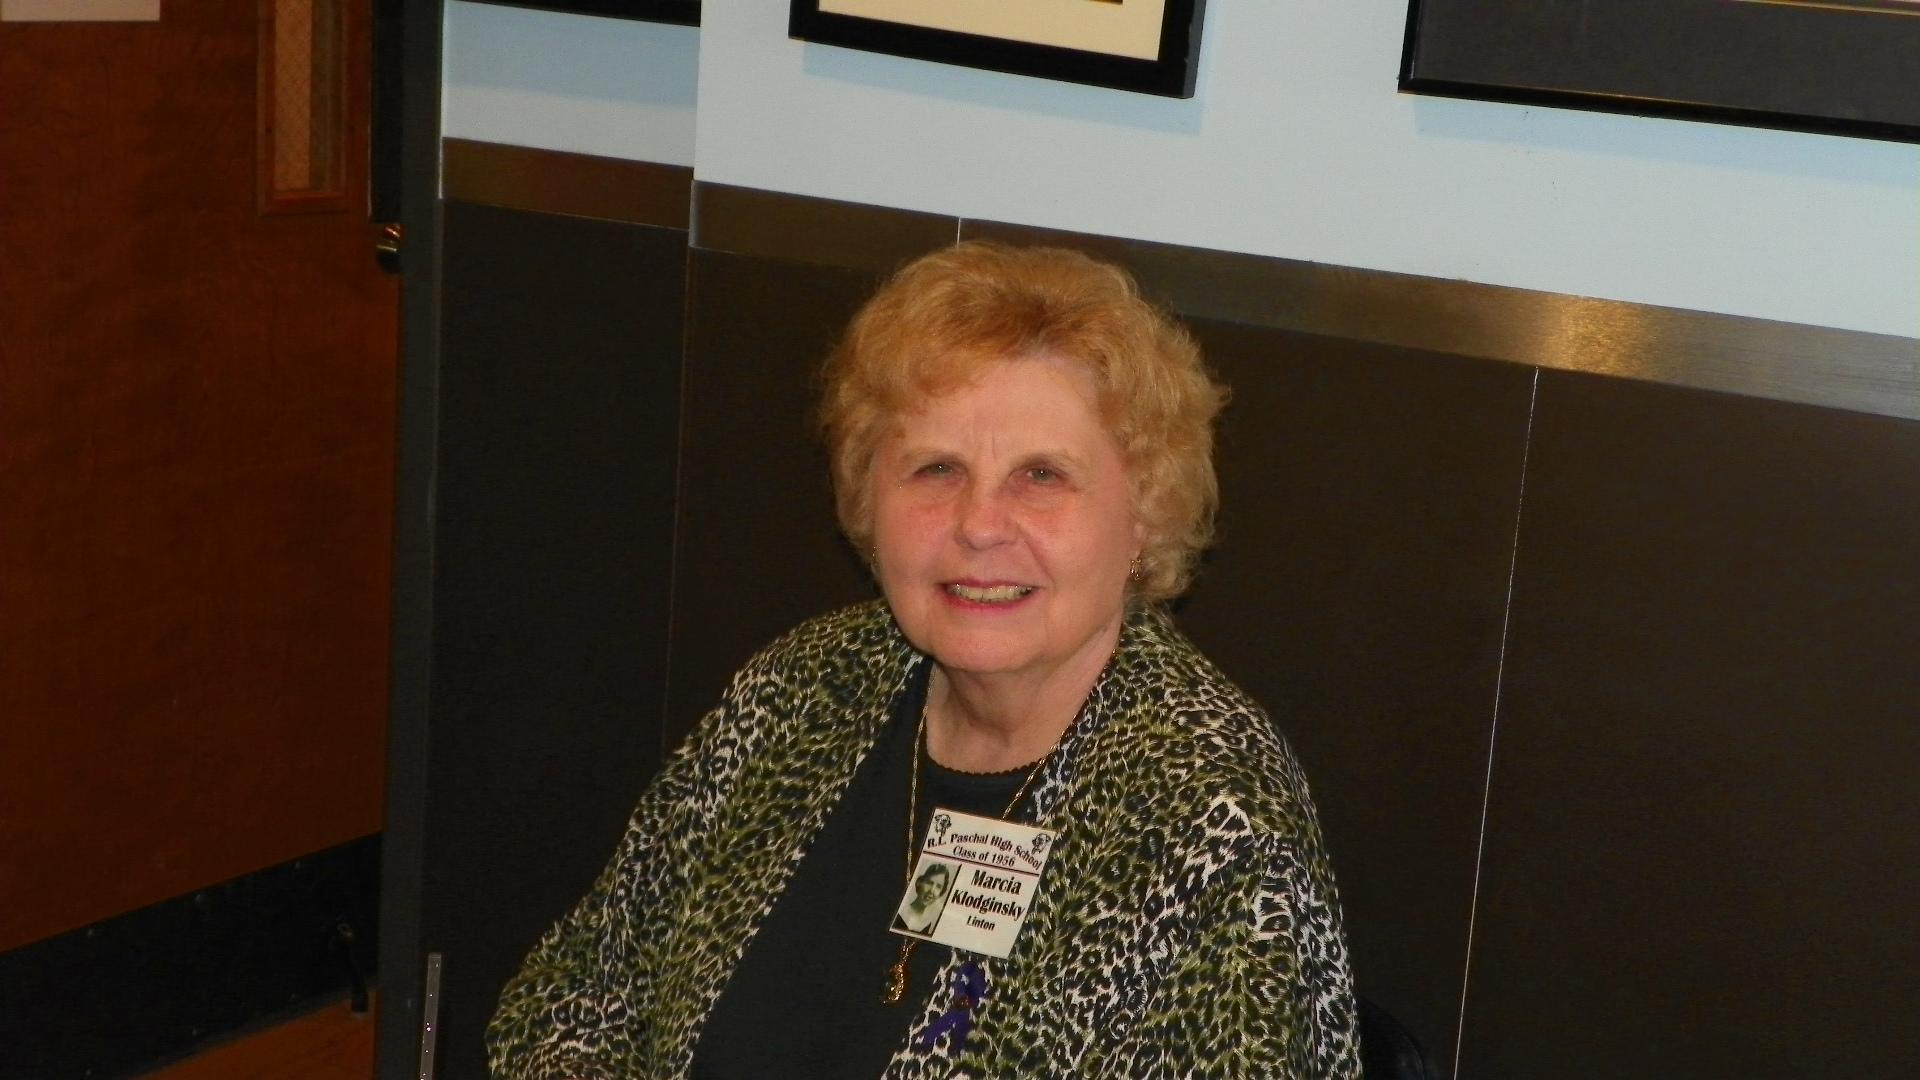 Marcia Klodginsky Linton